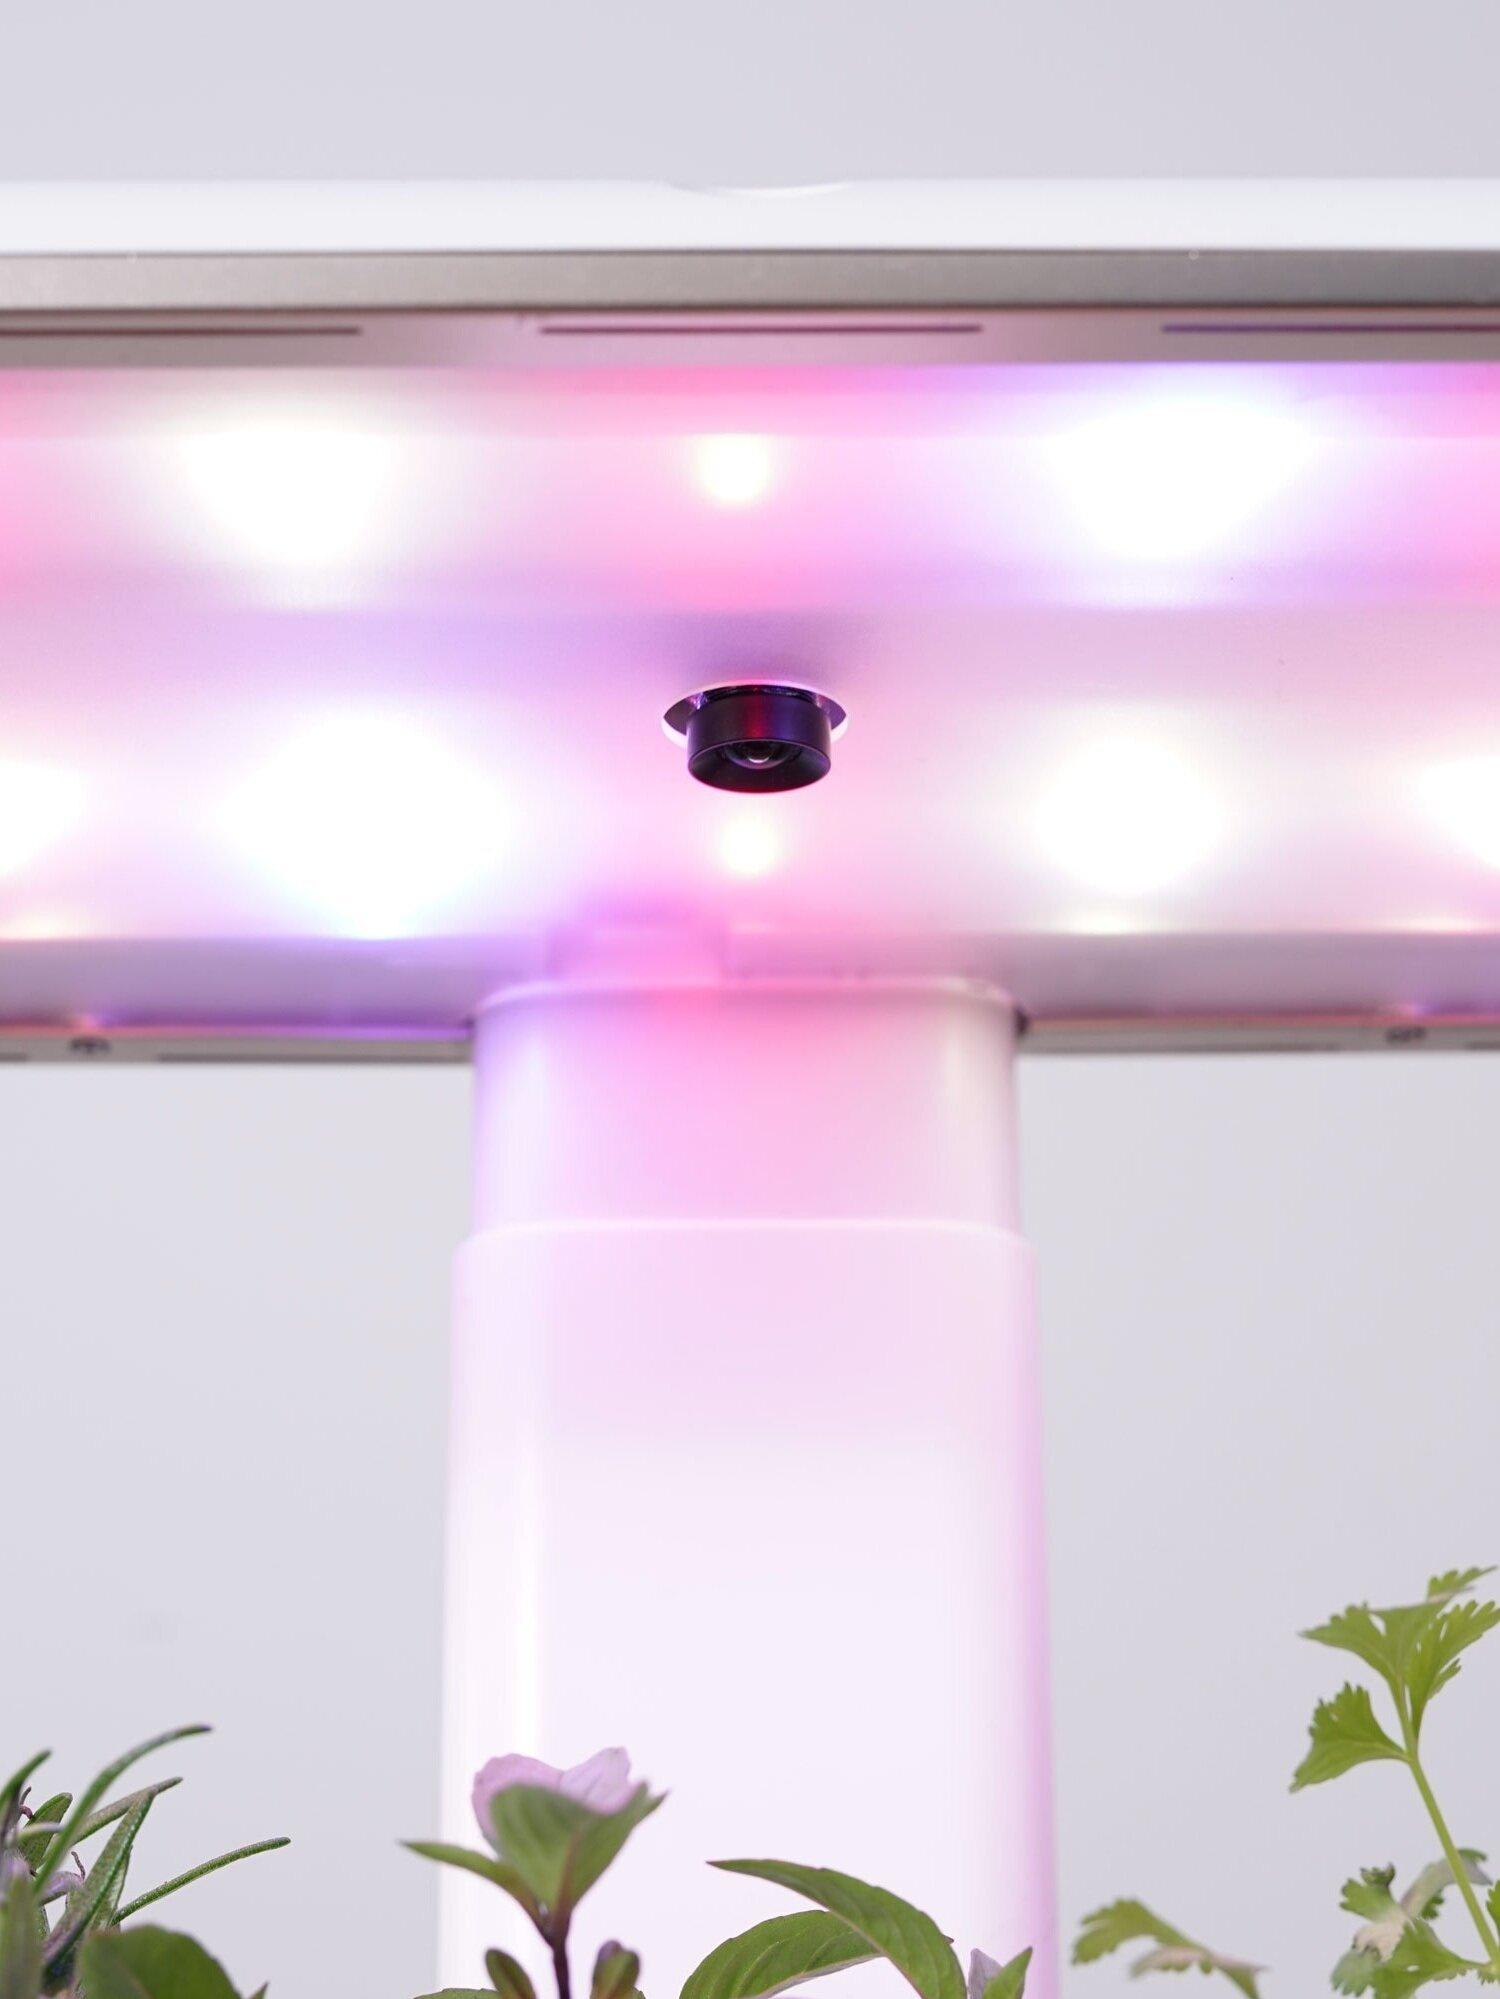 A closeup photo of the AVA Smart Garden camera module and lights.